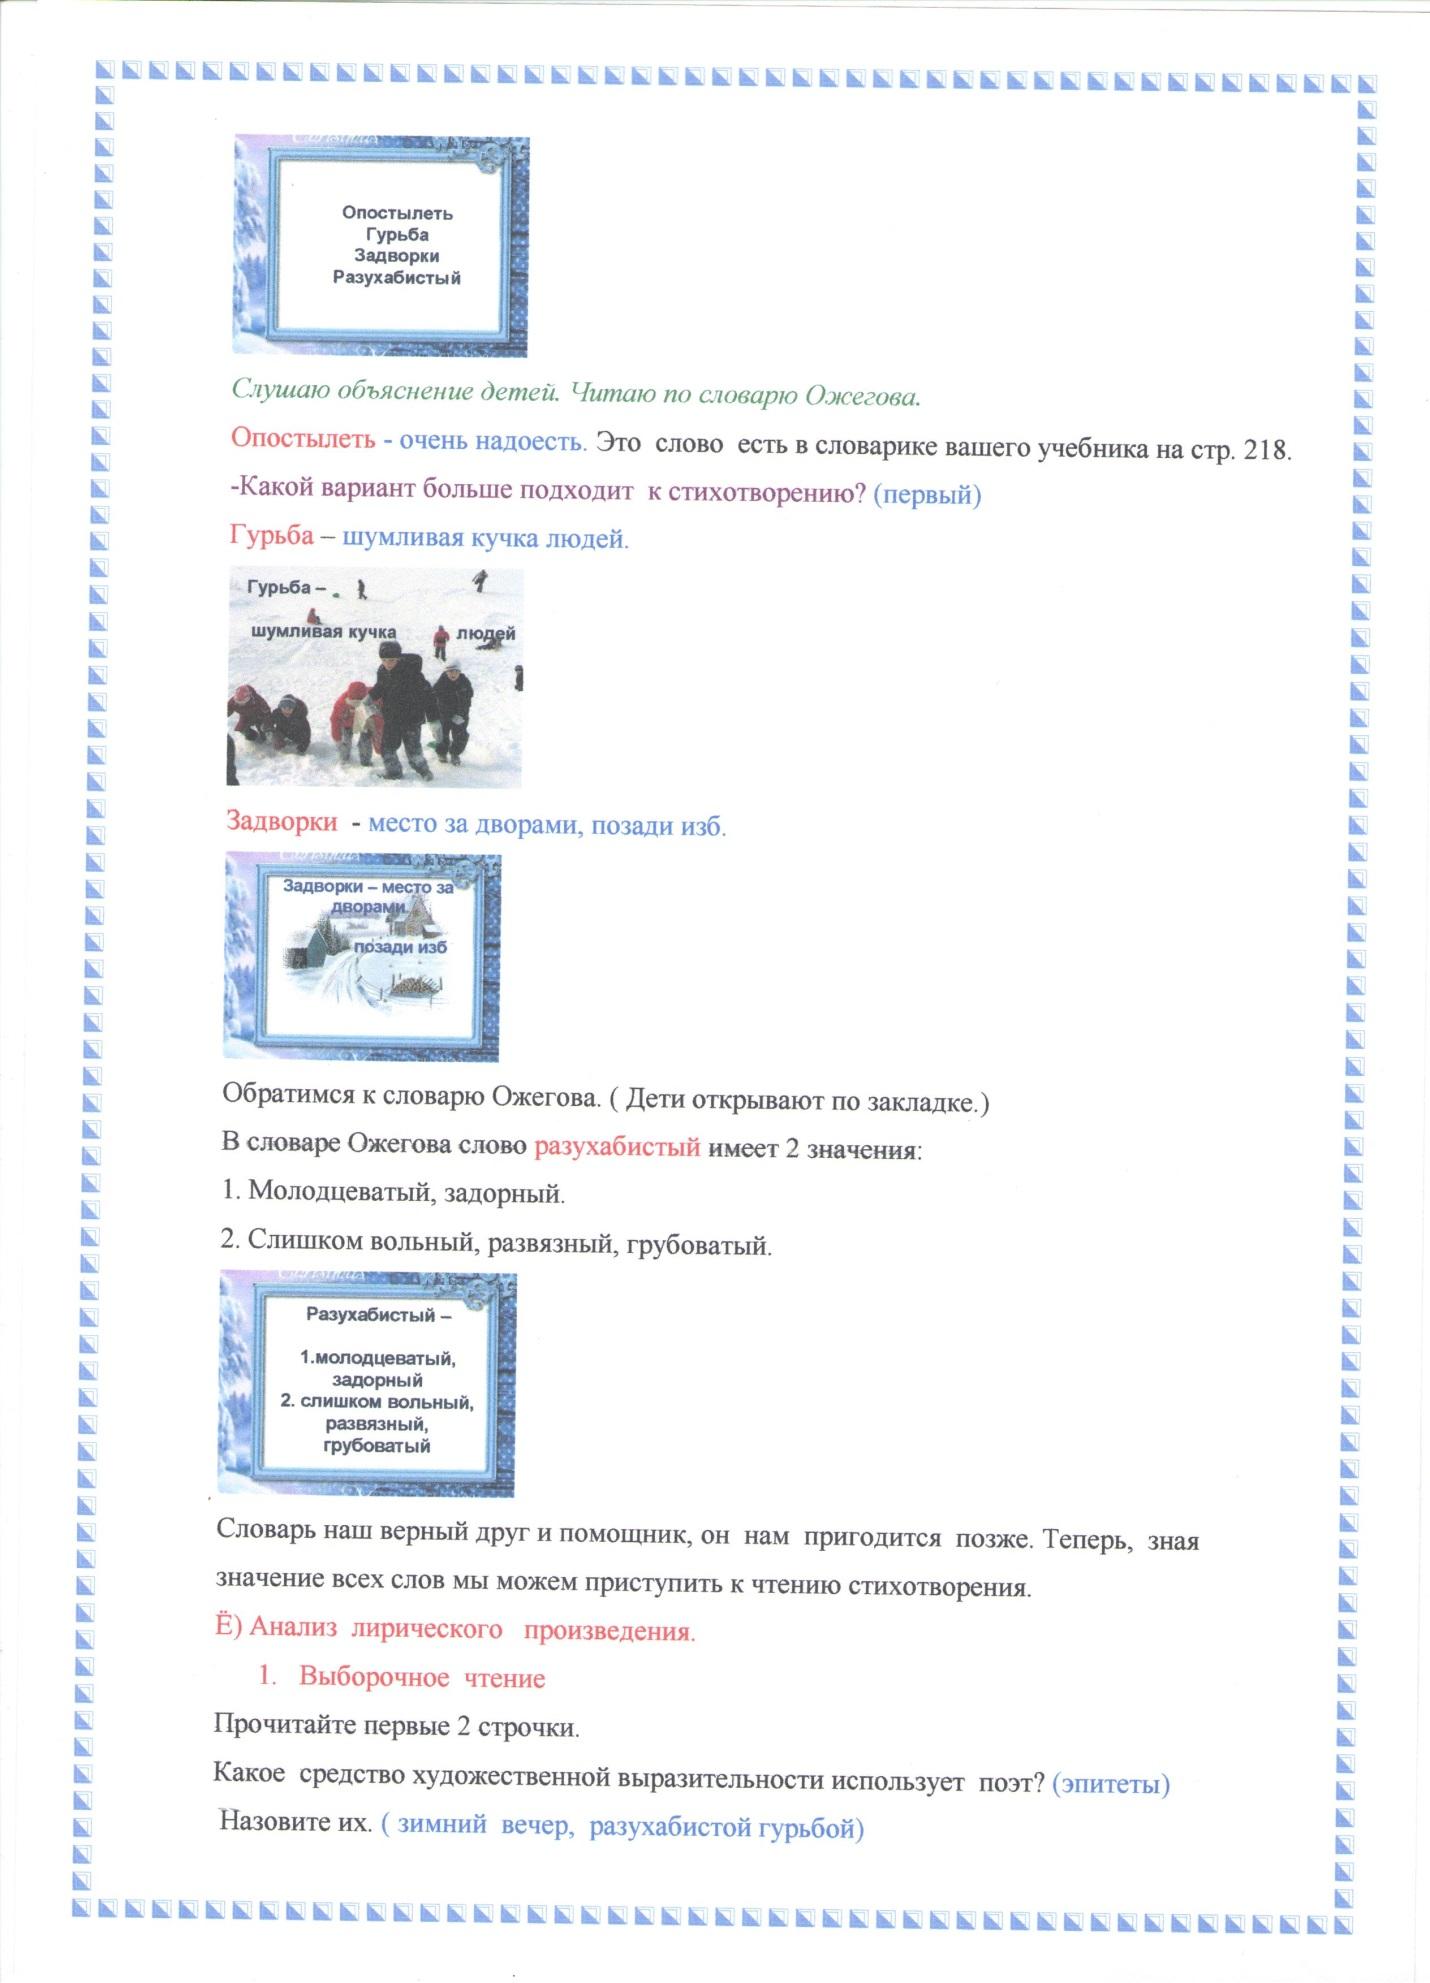 C:\Users\User\Desktop\3Б\2015-10-16 7\7 001.jpg